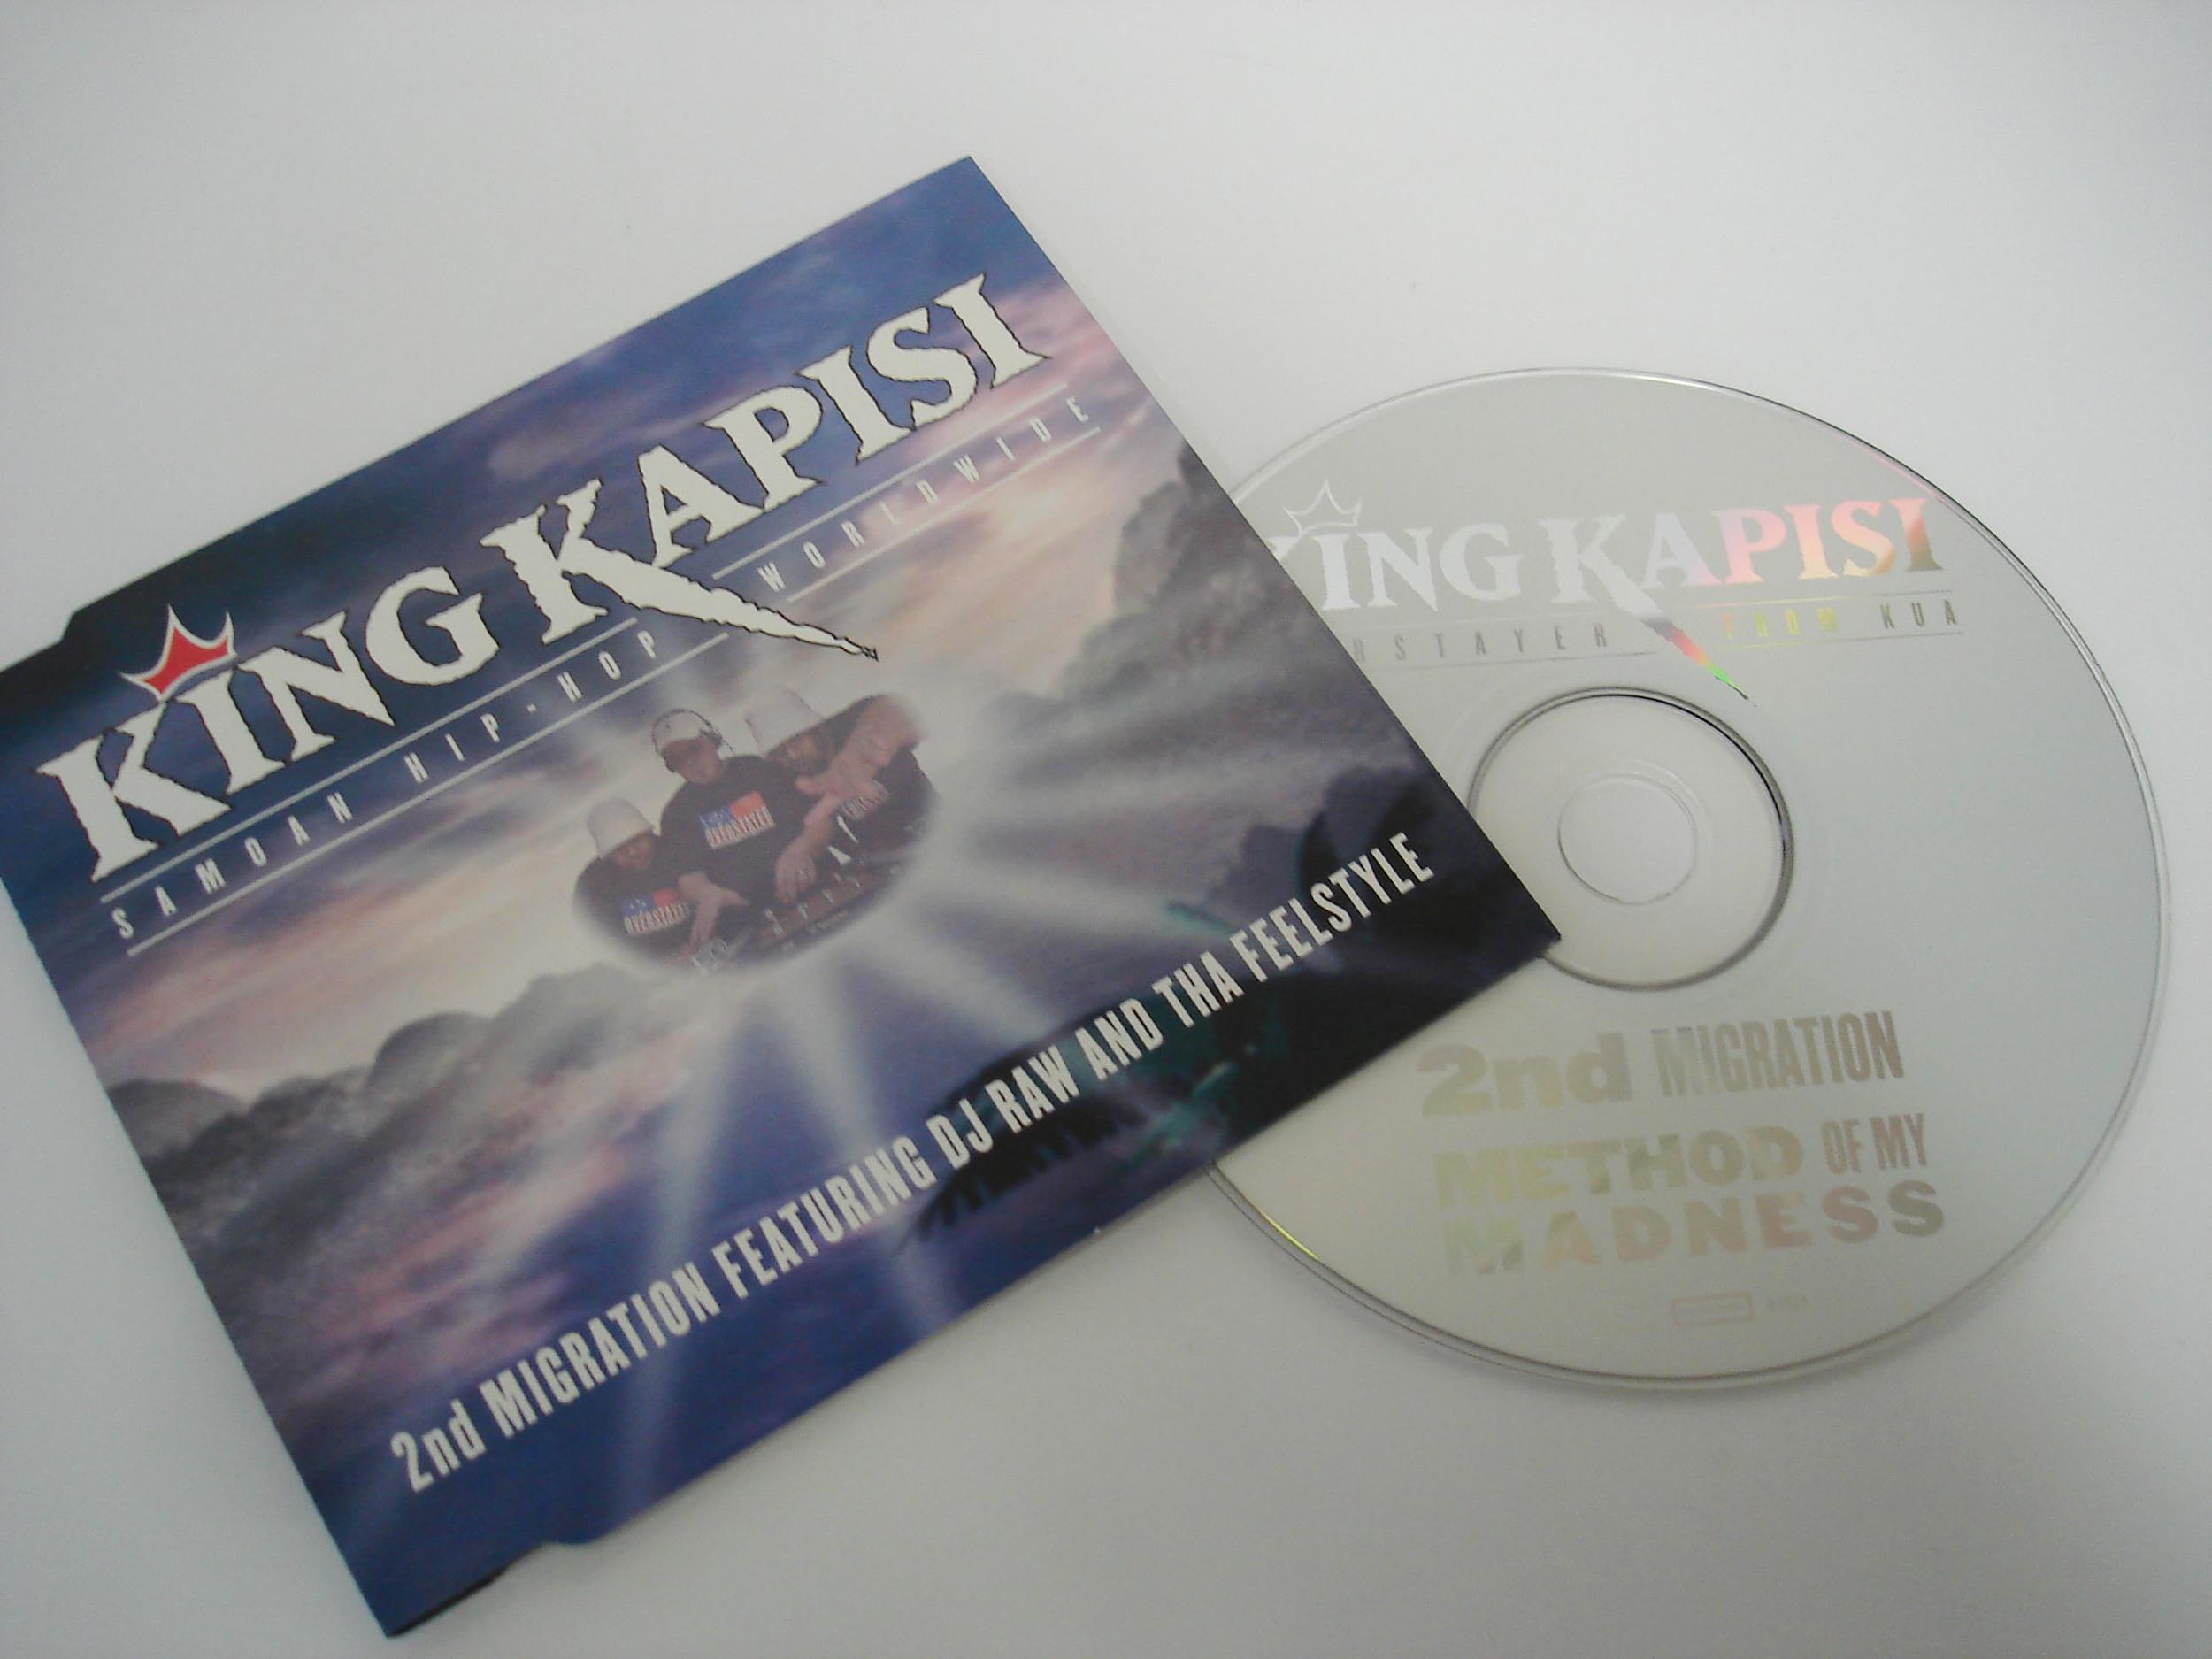 KING KAPISI - SECOND MIGRATION - SINGLE